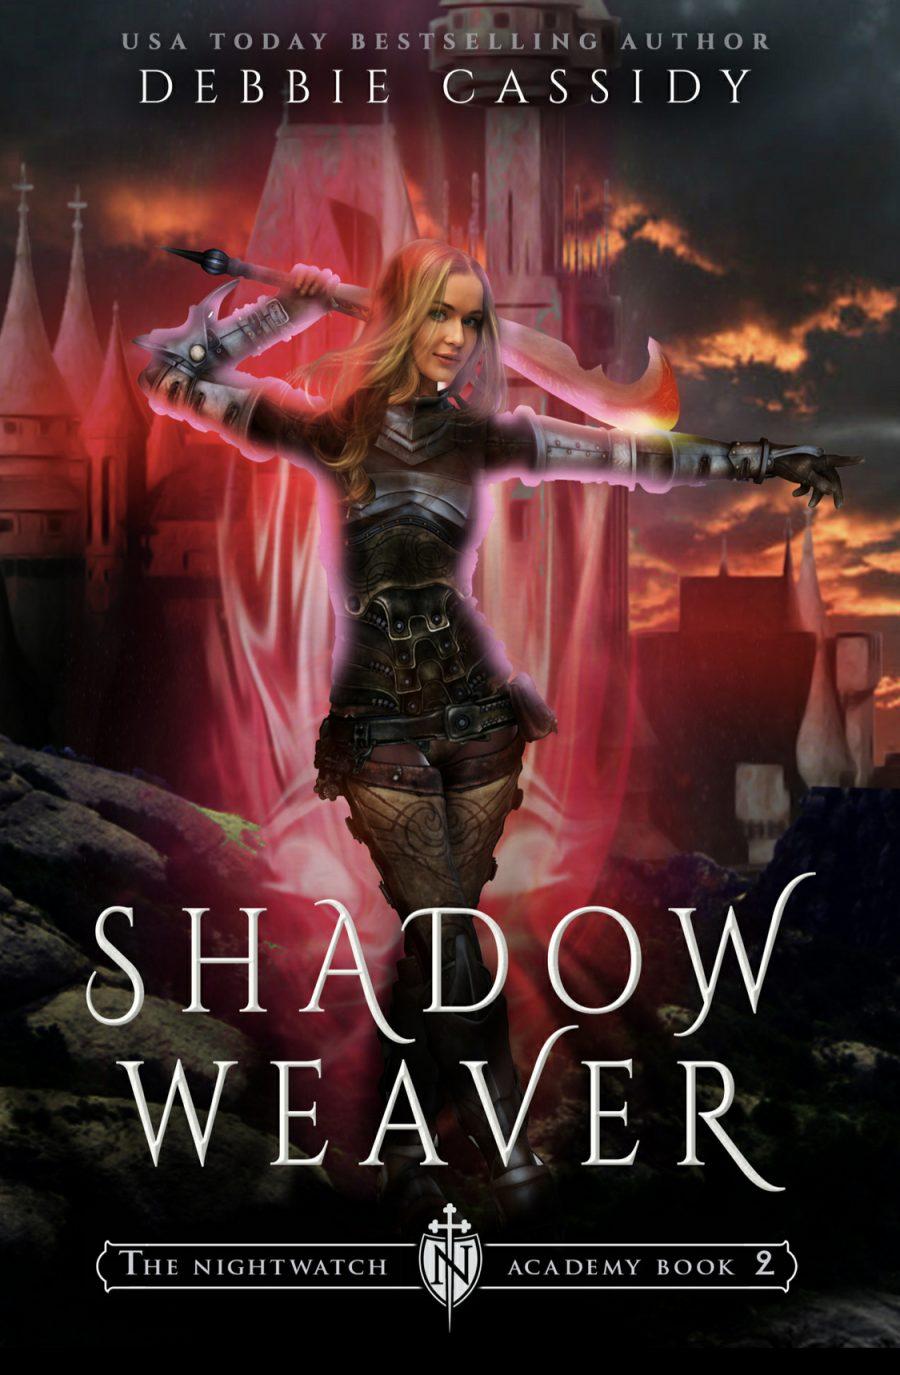 Shadow Weaver by Debbie Cassidy - A Book Review #BookReview #SlowBurn #RH #ReverseHarem #Fantasy #Academy #KindleUnlimited #KU